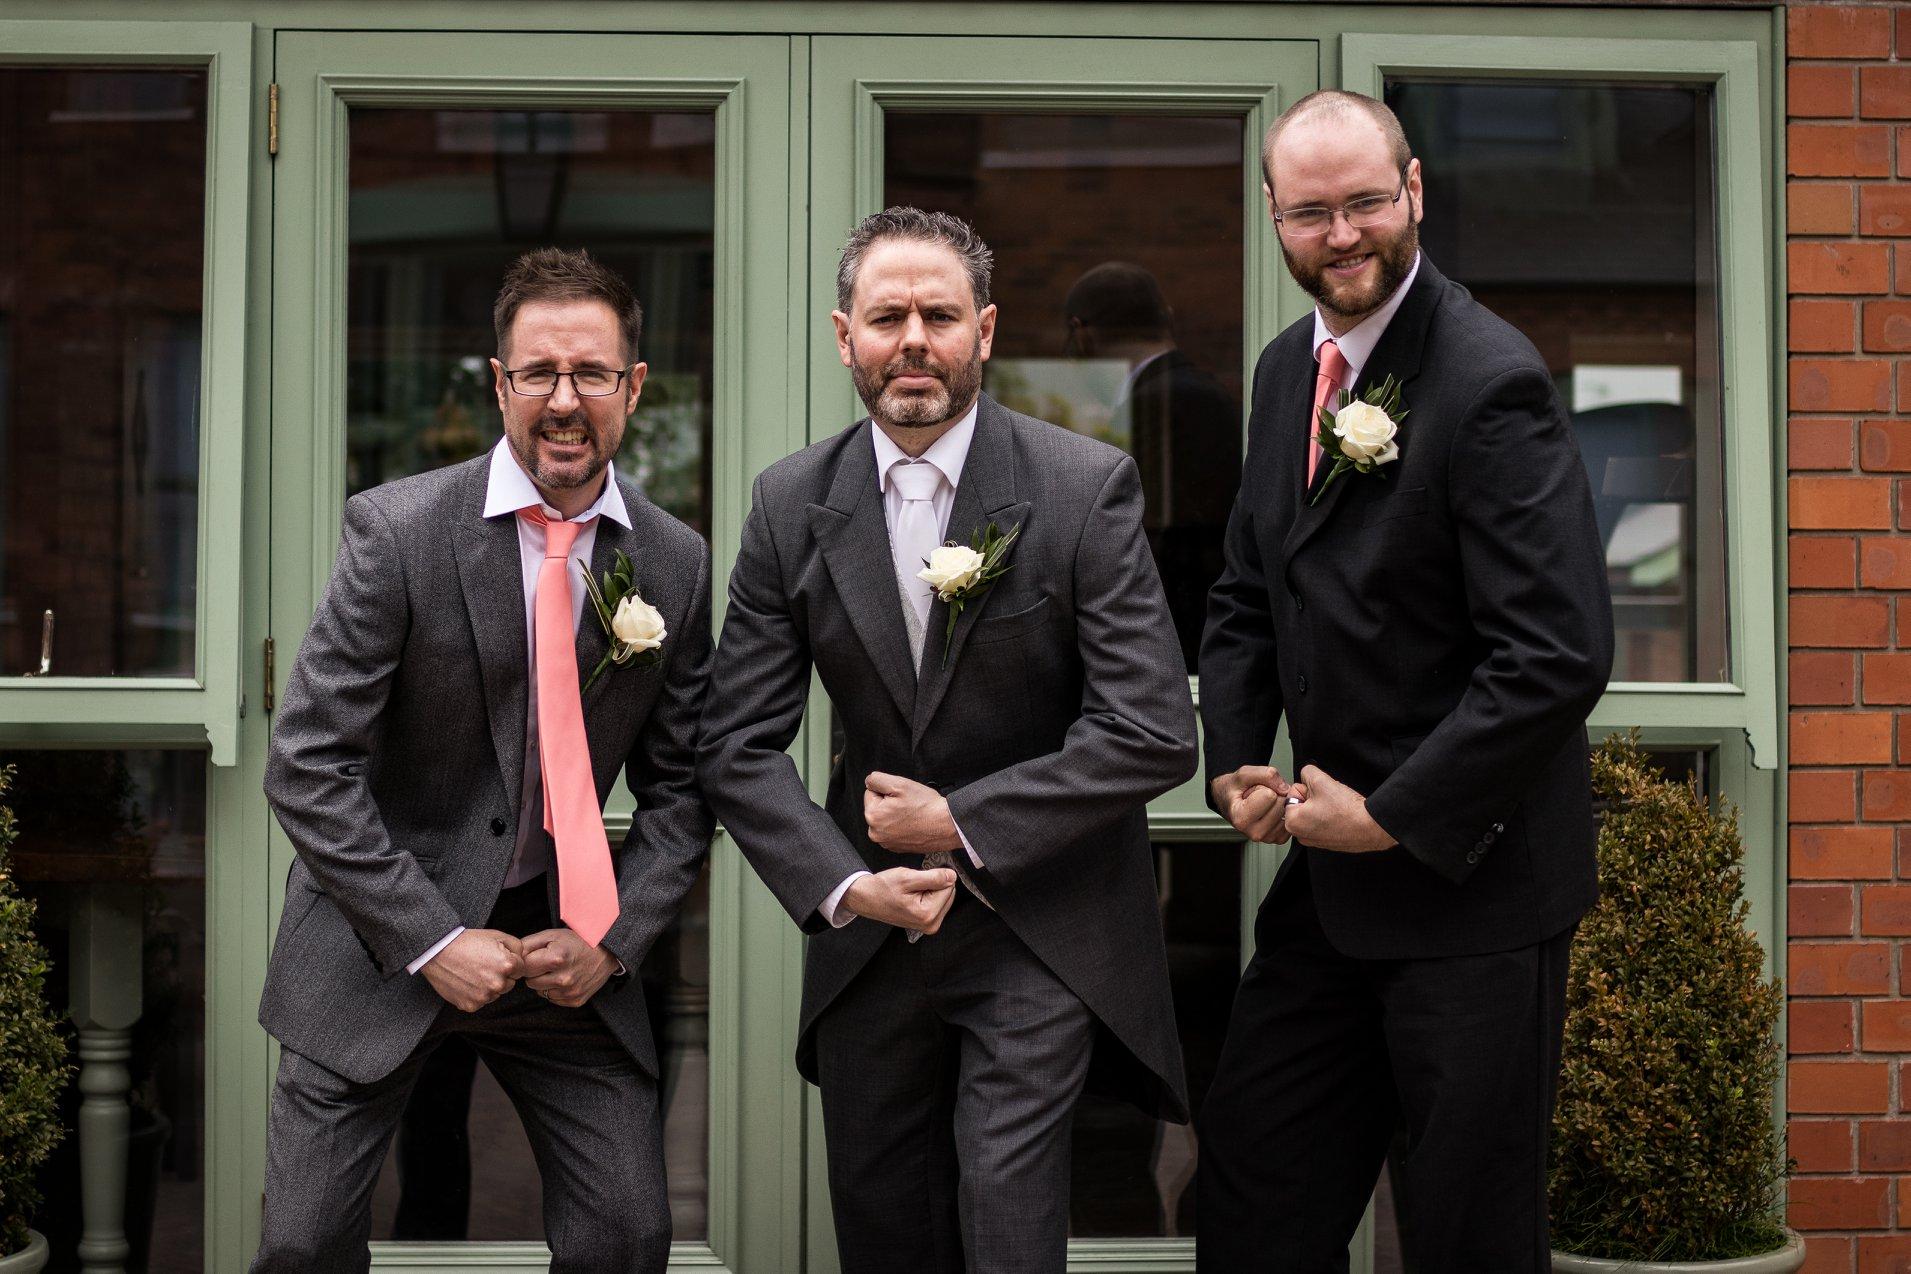 Paul + Aimee's Wedding - Aston Tavern Birmingham, UK - Peter Horrox Photography